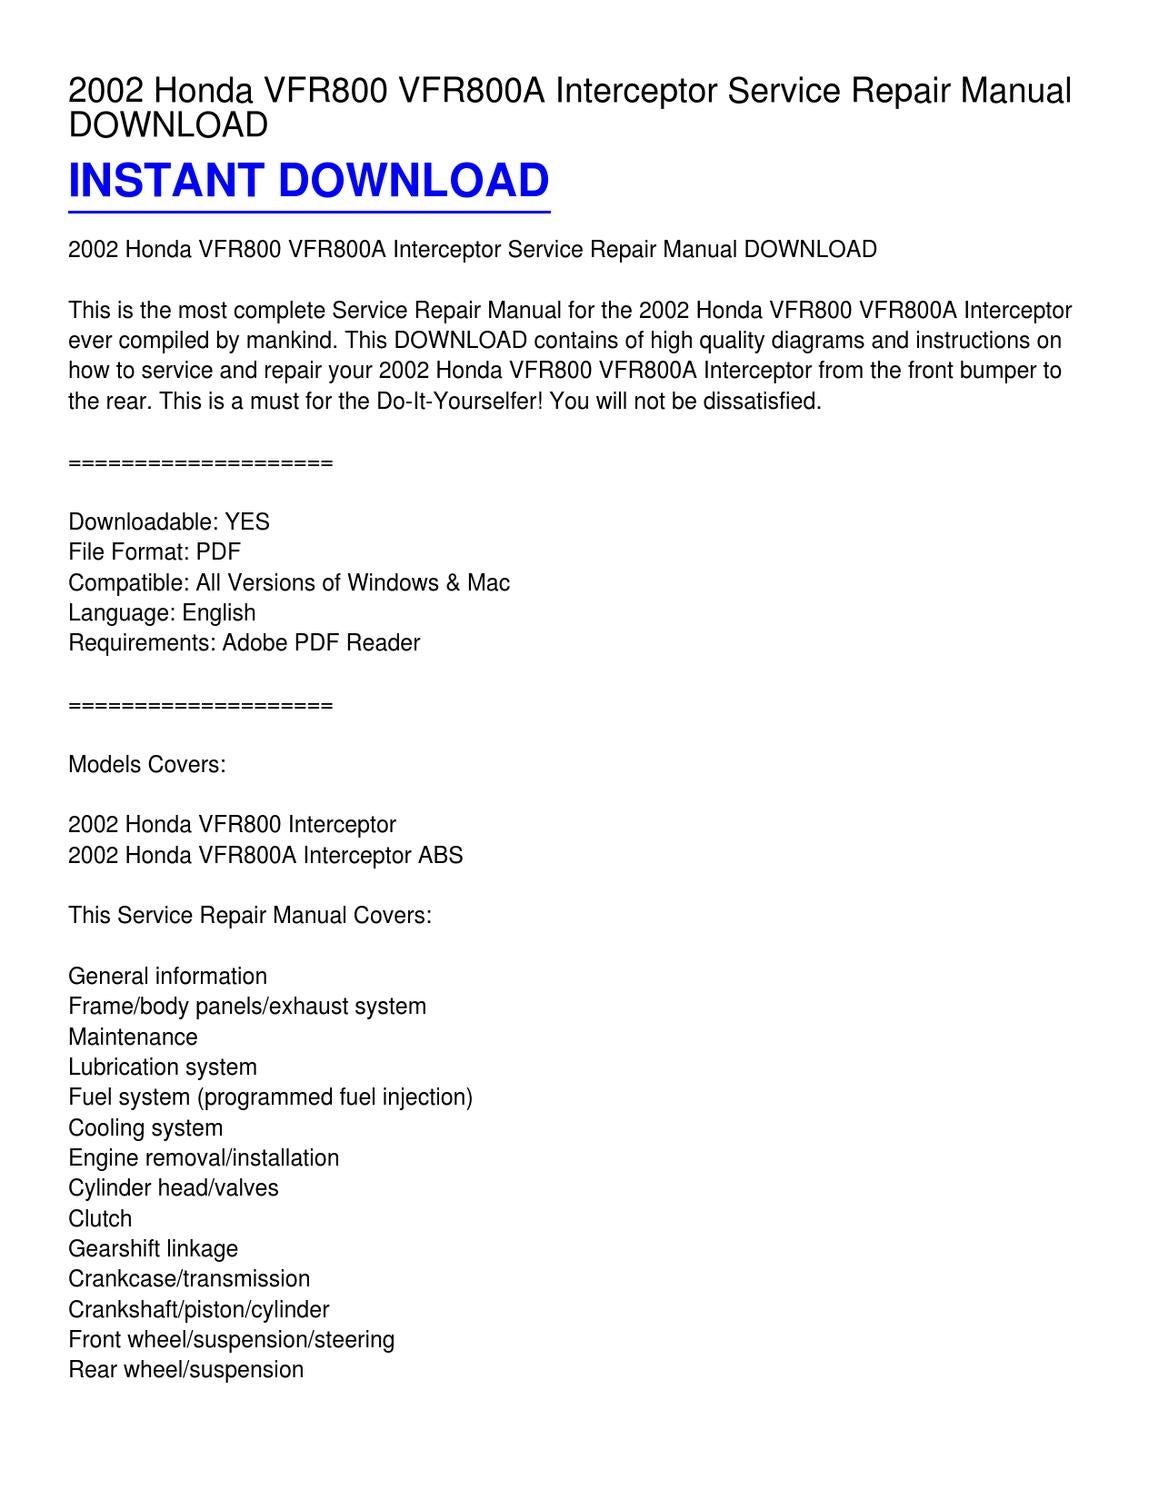 2002 Honda VFR800 VFR800A Interceptor Service Repair Manual ...